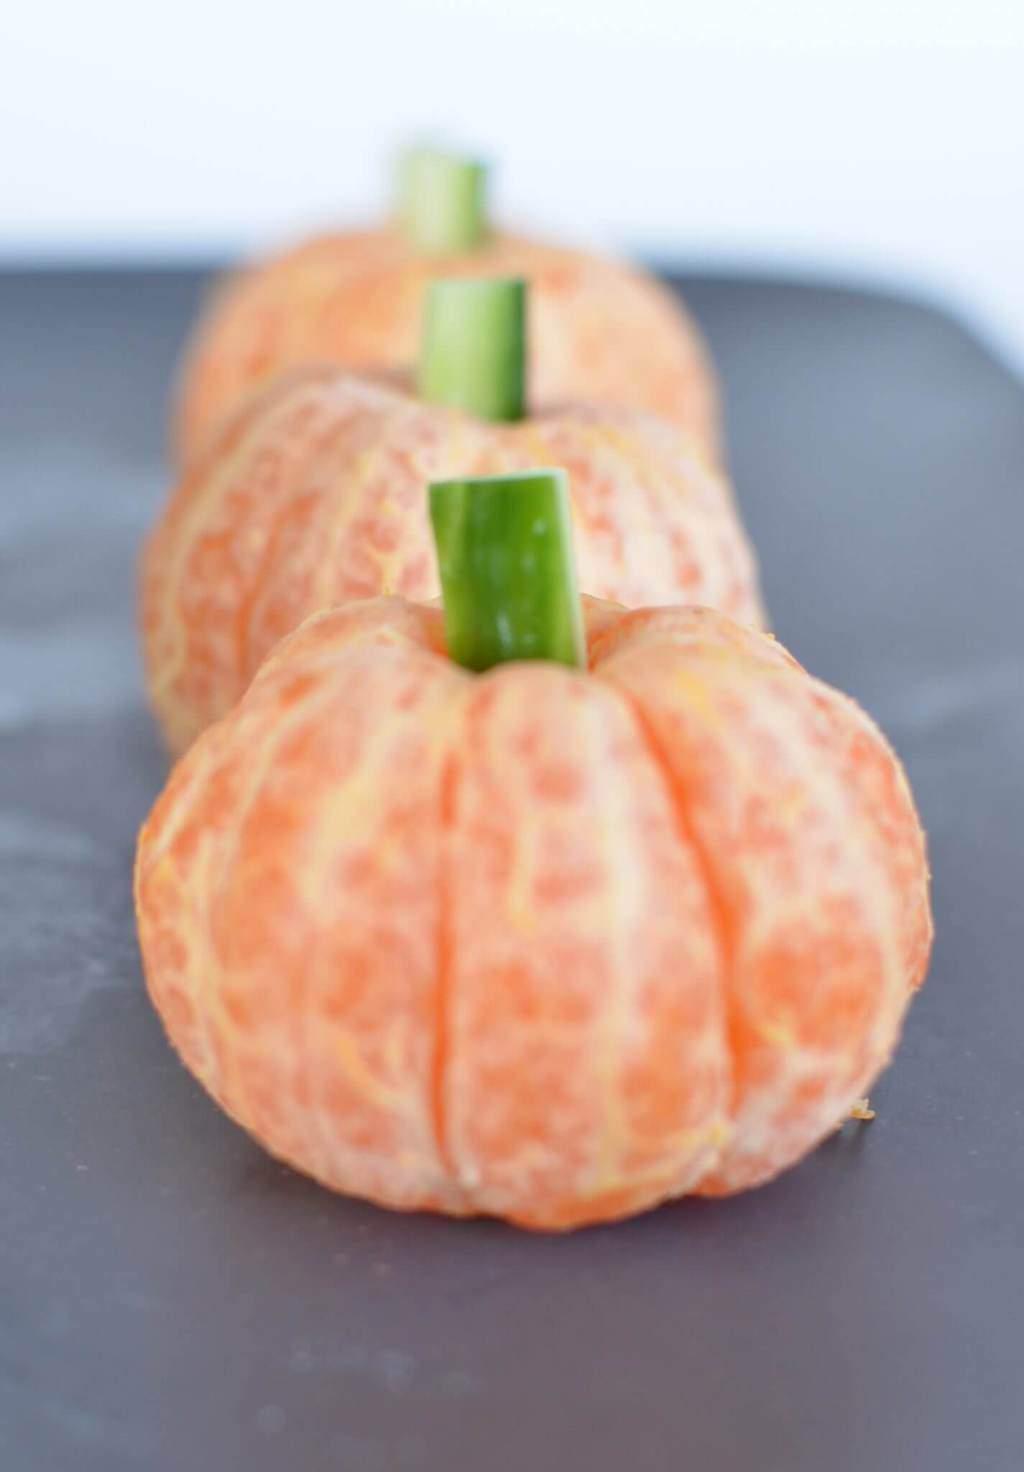 Healthy halloween treats with fun pumpkins made from mandarins